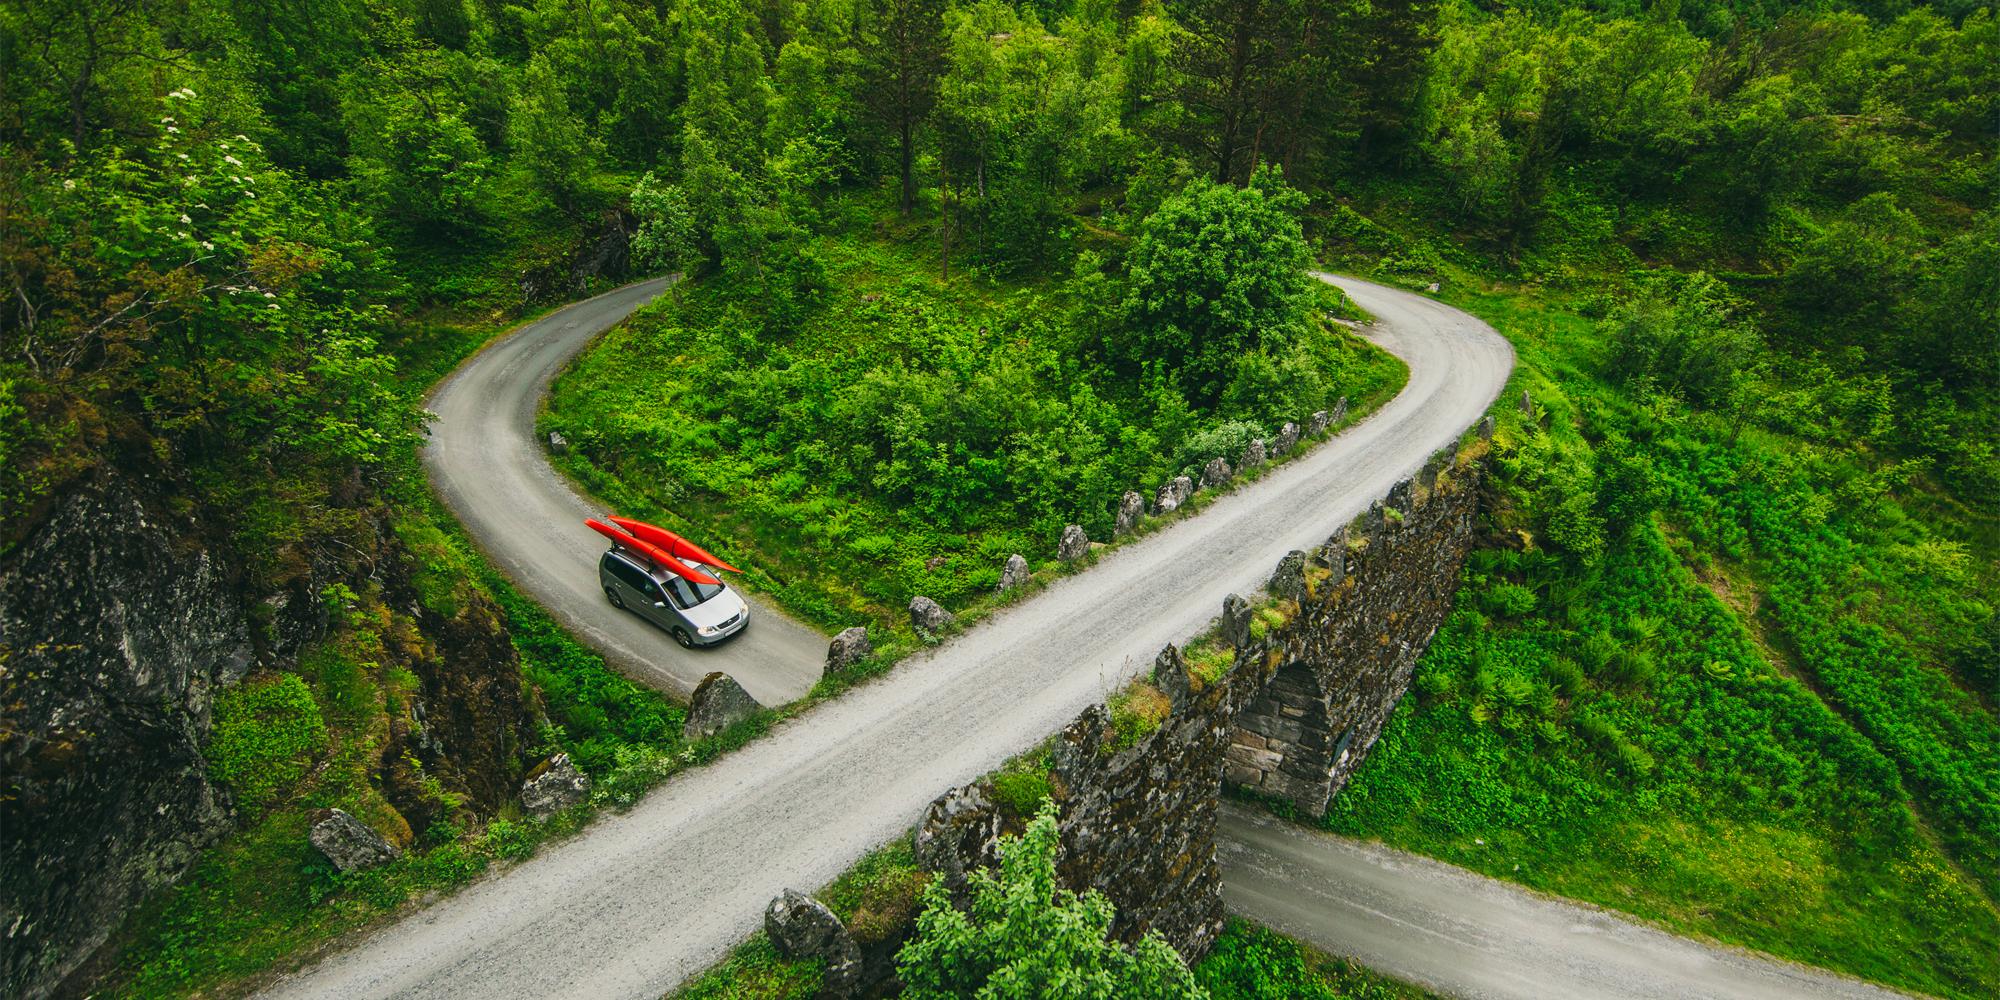 Road safety | Car safety | Bike safety